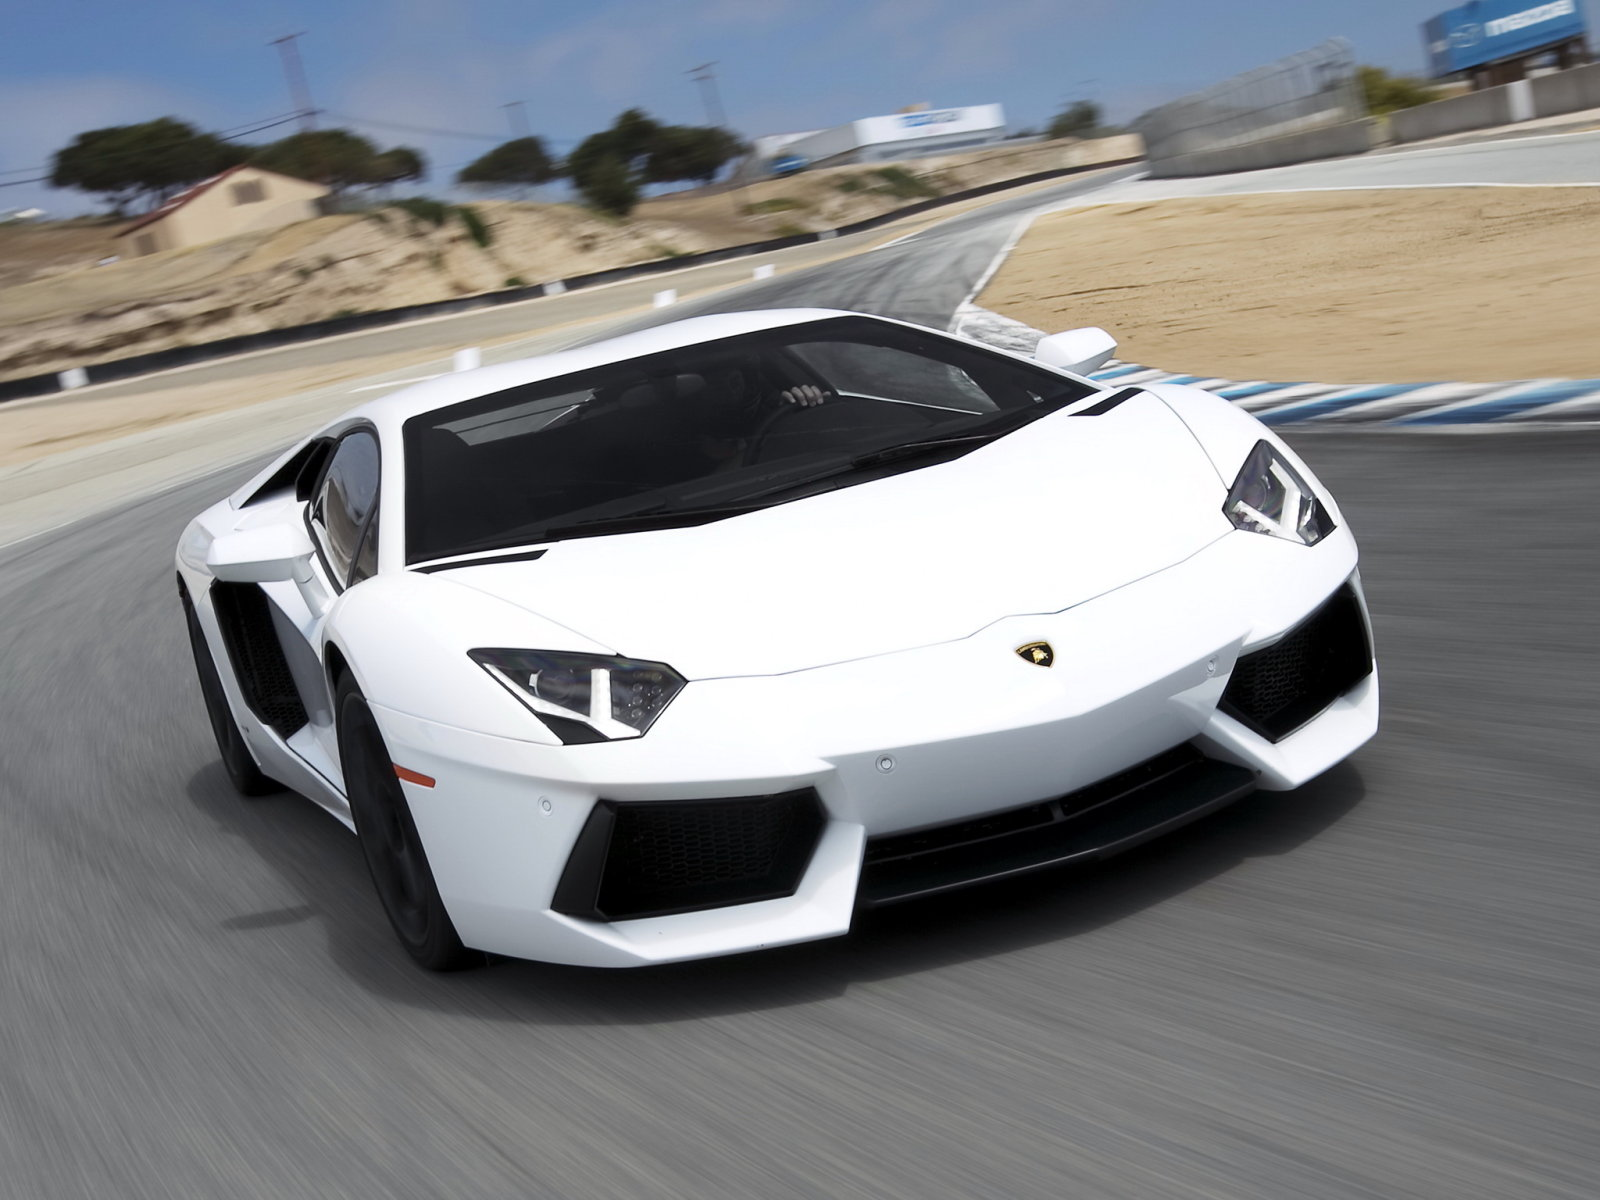 Lamborghini (Ламборджини) Aventador 2011- г.